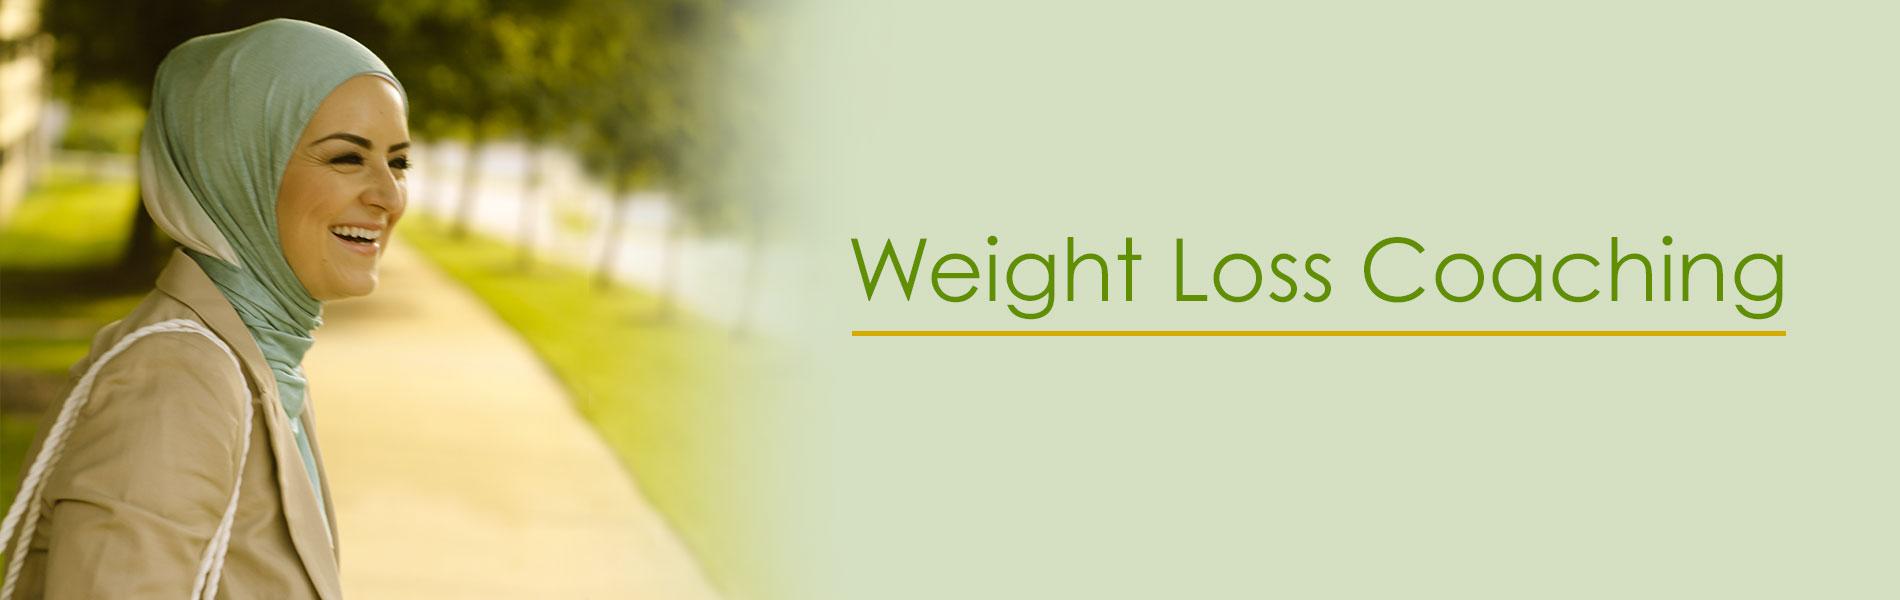 Weight loss 8 months postpartum photo 2